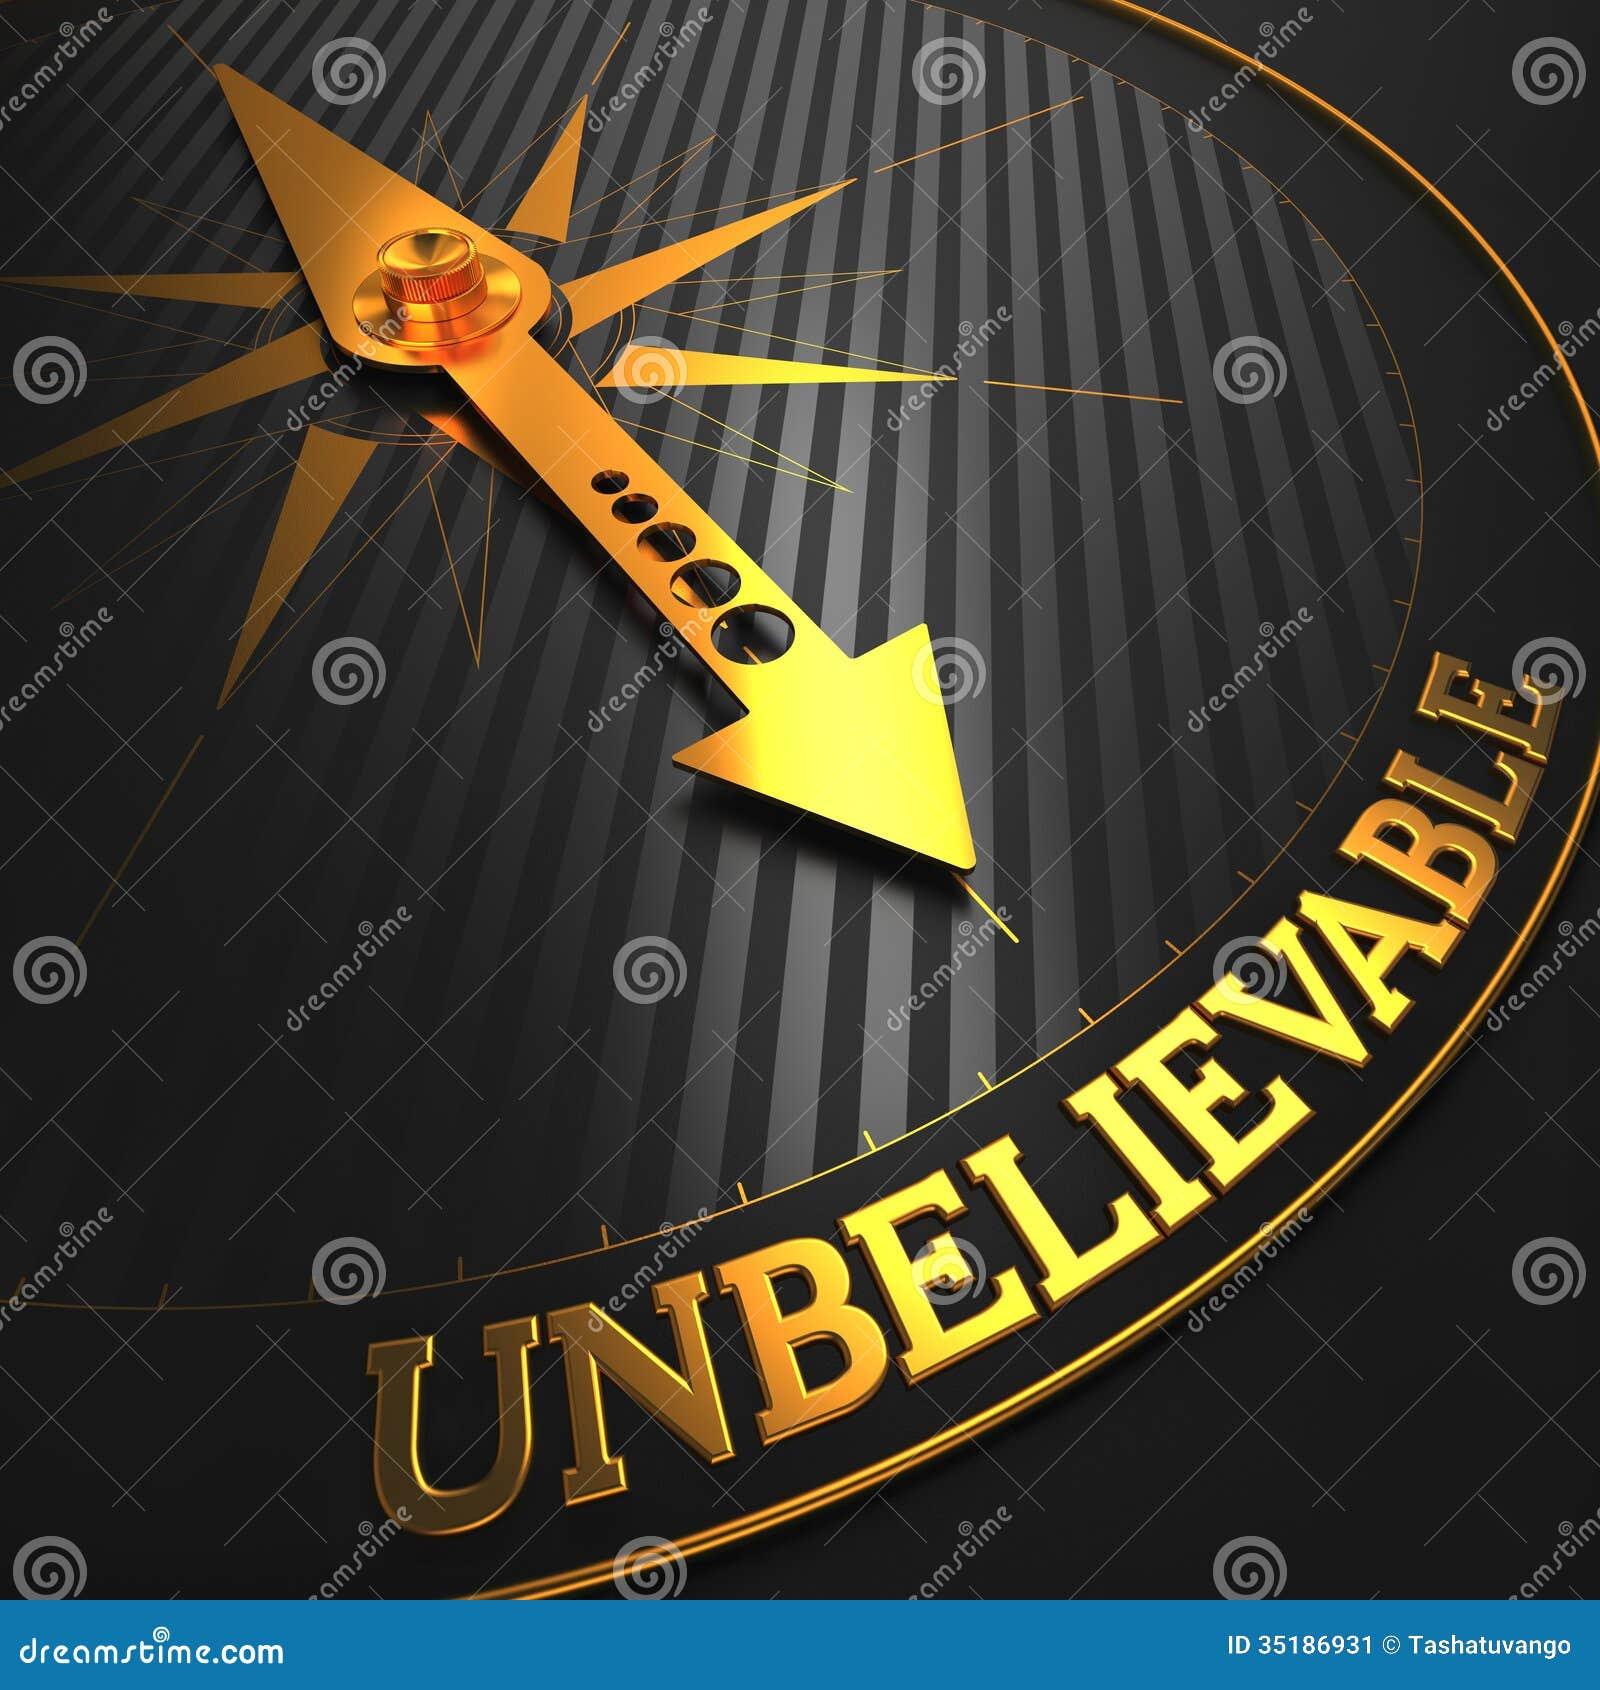 Unbelievable Business Concept Stock Image Image 35186931